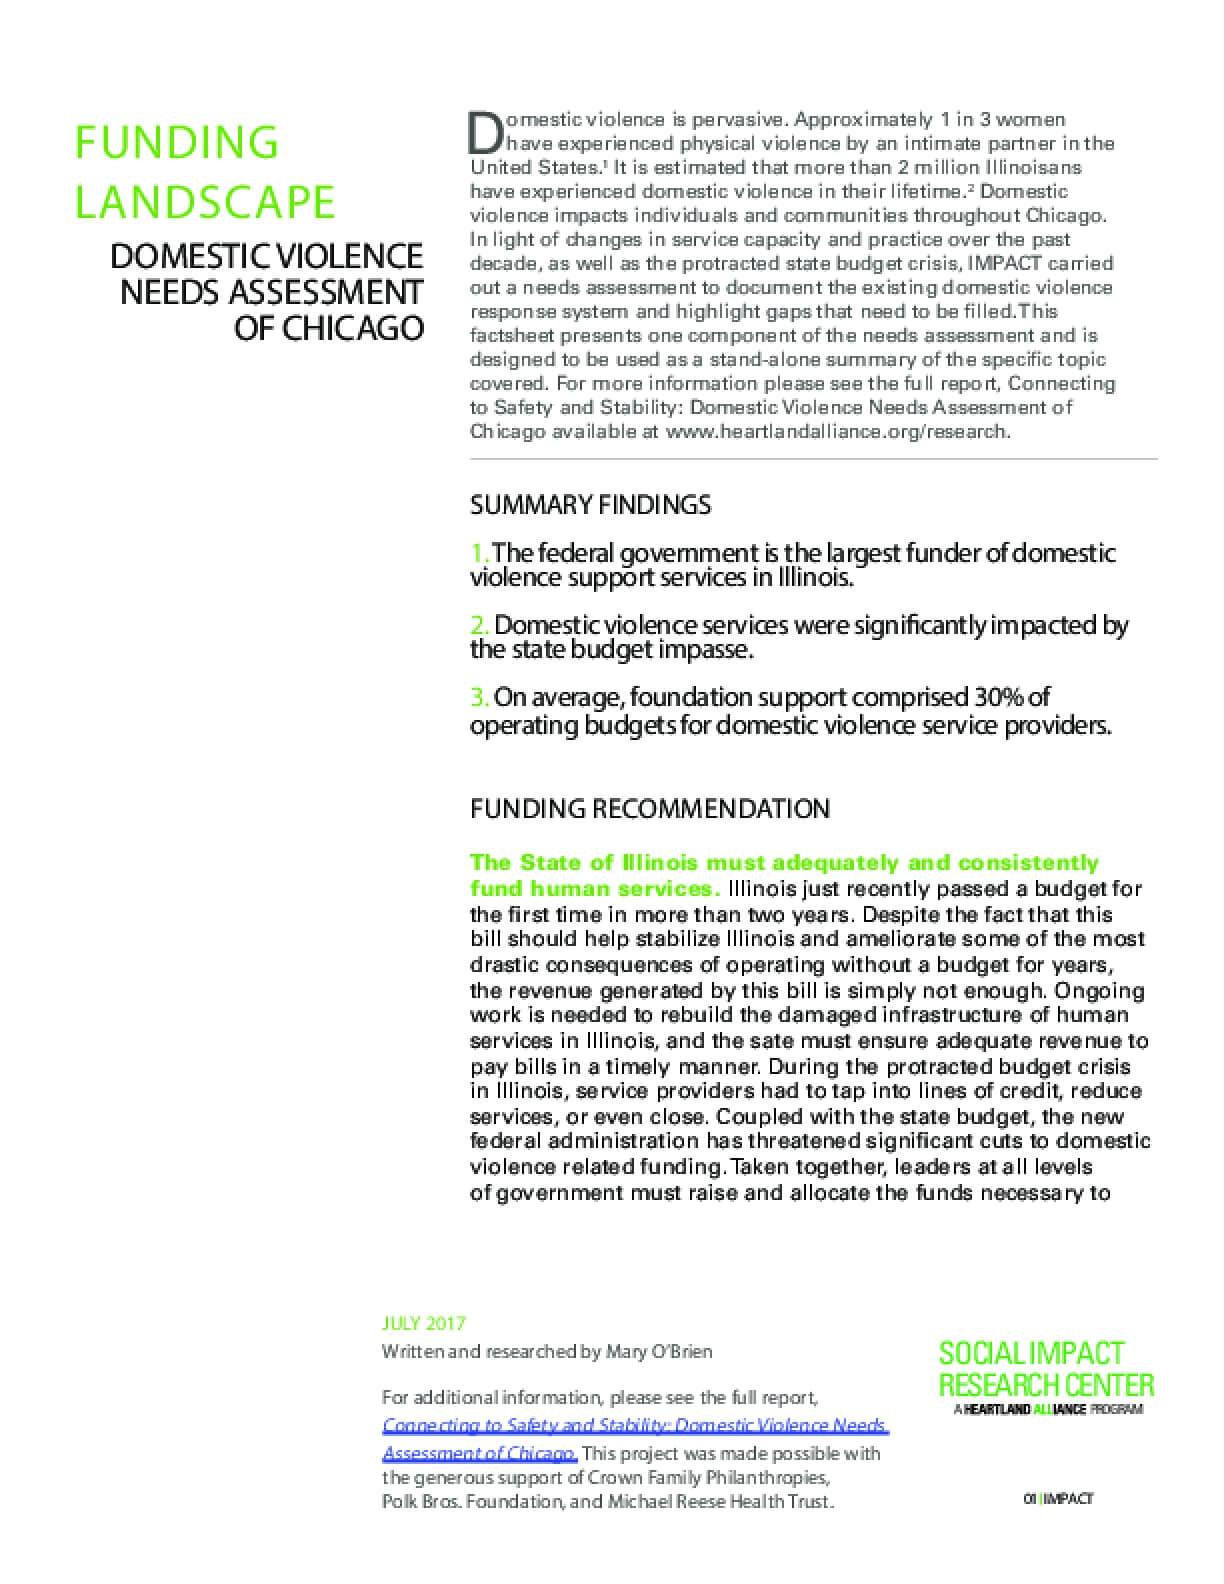 Factsheet: Funding Landscape (DV Landscape Report)